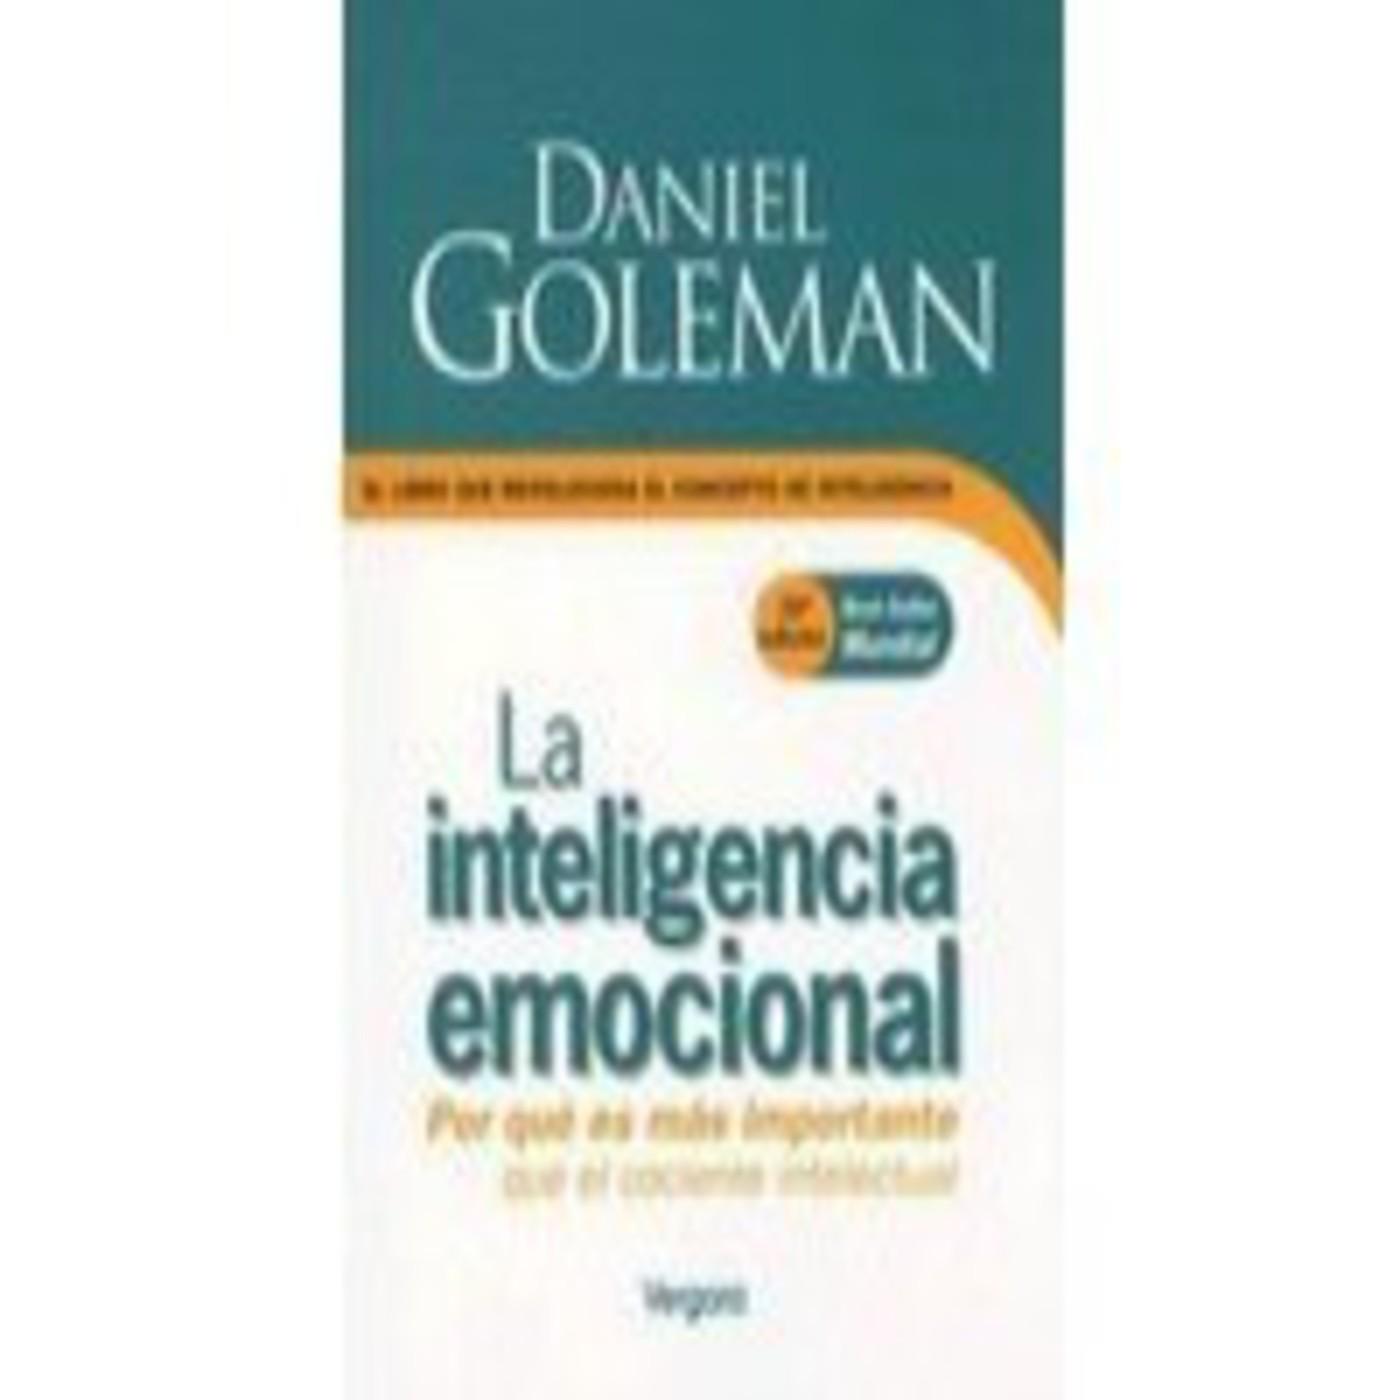 37..INTELIGENCIA EMOCIONAL, Daniel Goleman